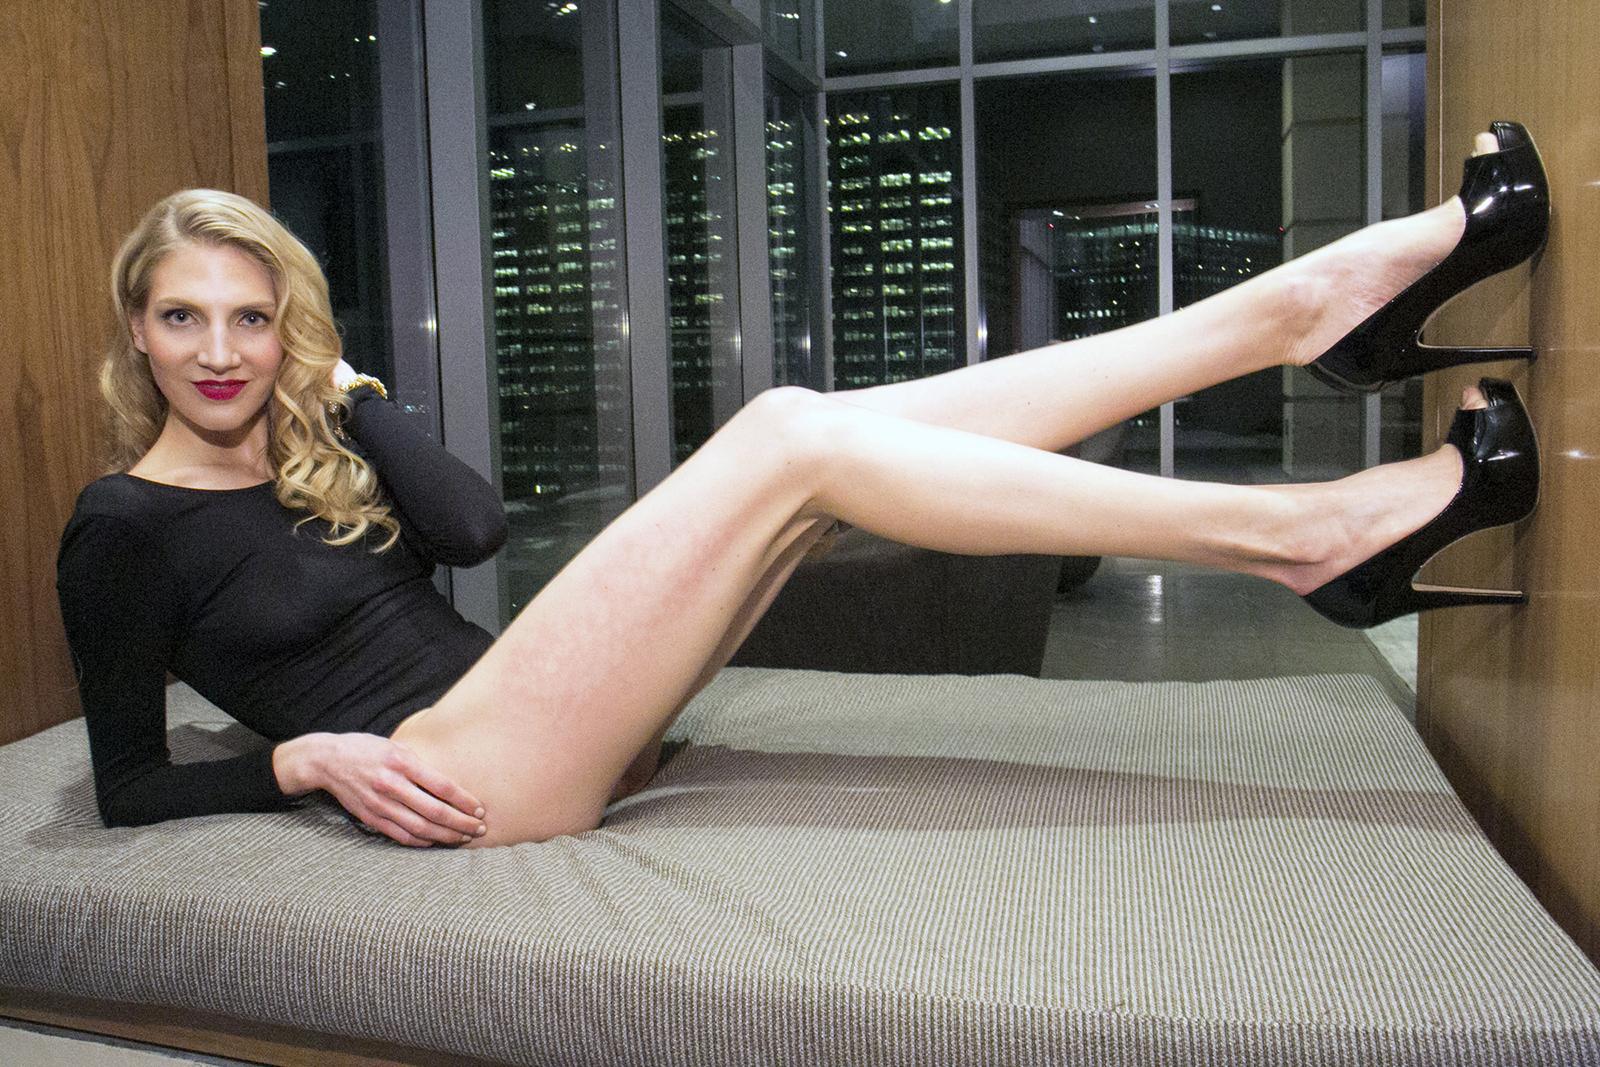 17-Year-Old Aspiring Model Breaks Record For Longest Legs